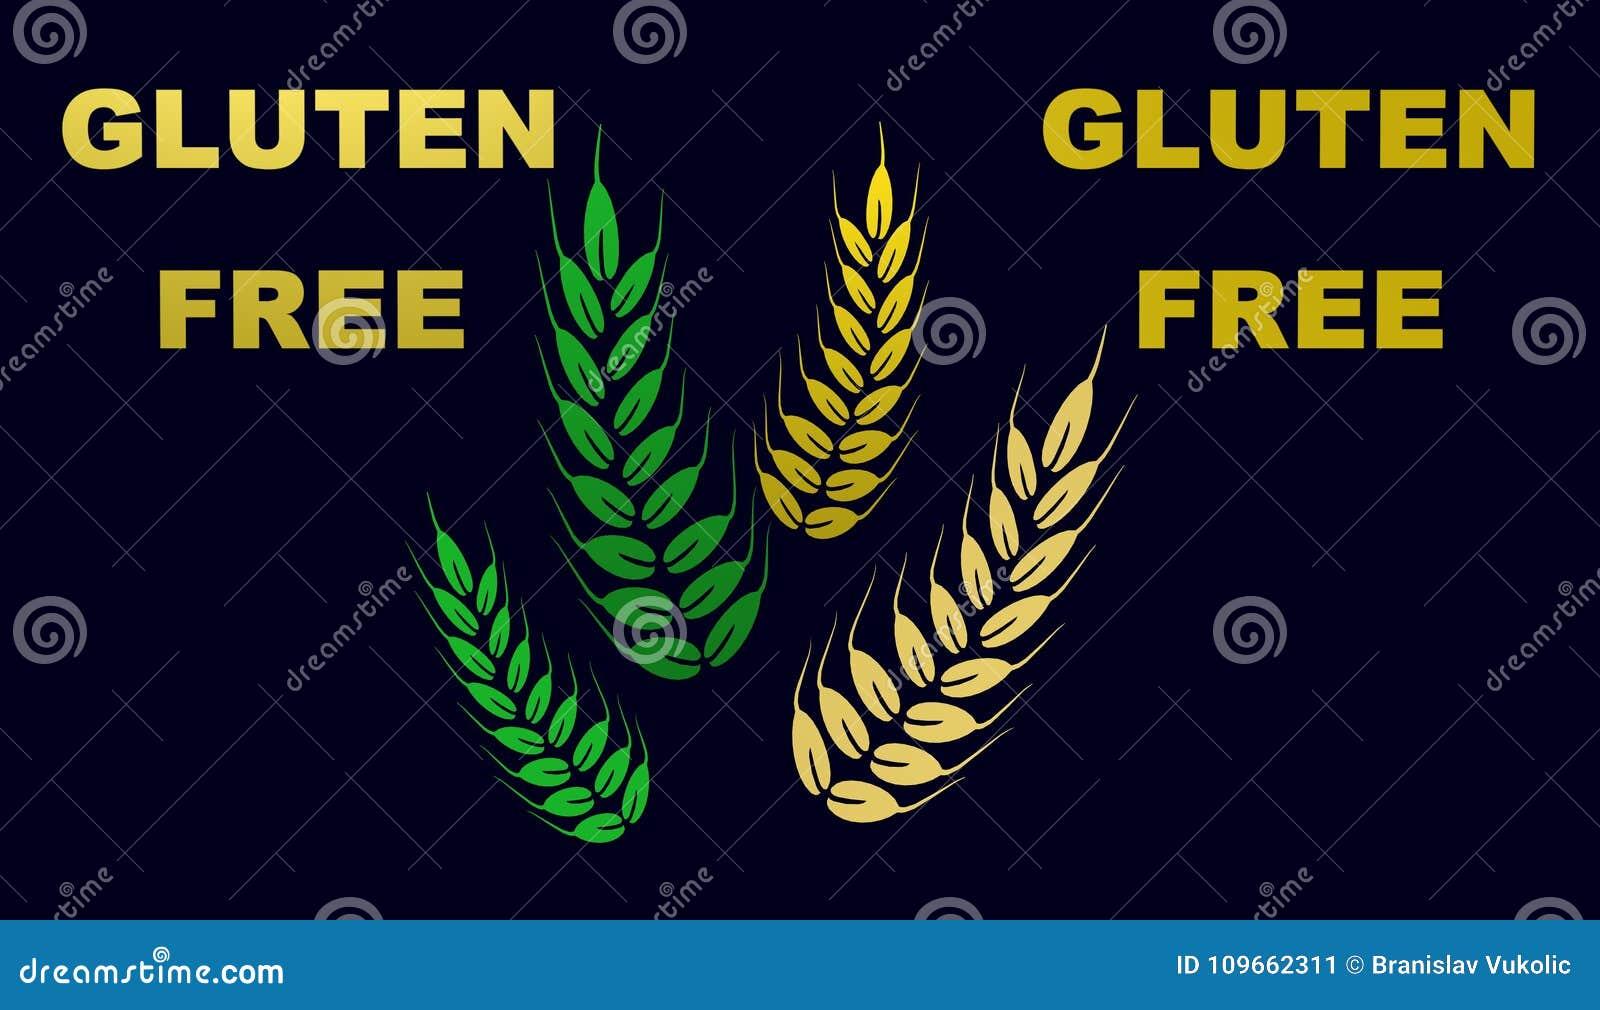 Gluten Free Icon,sign,3D Illustration,best Icon Stock